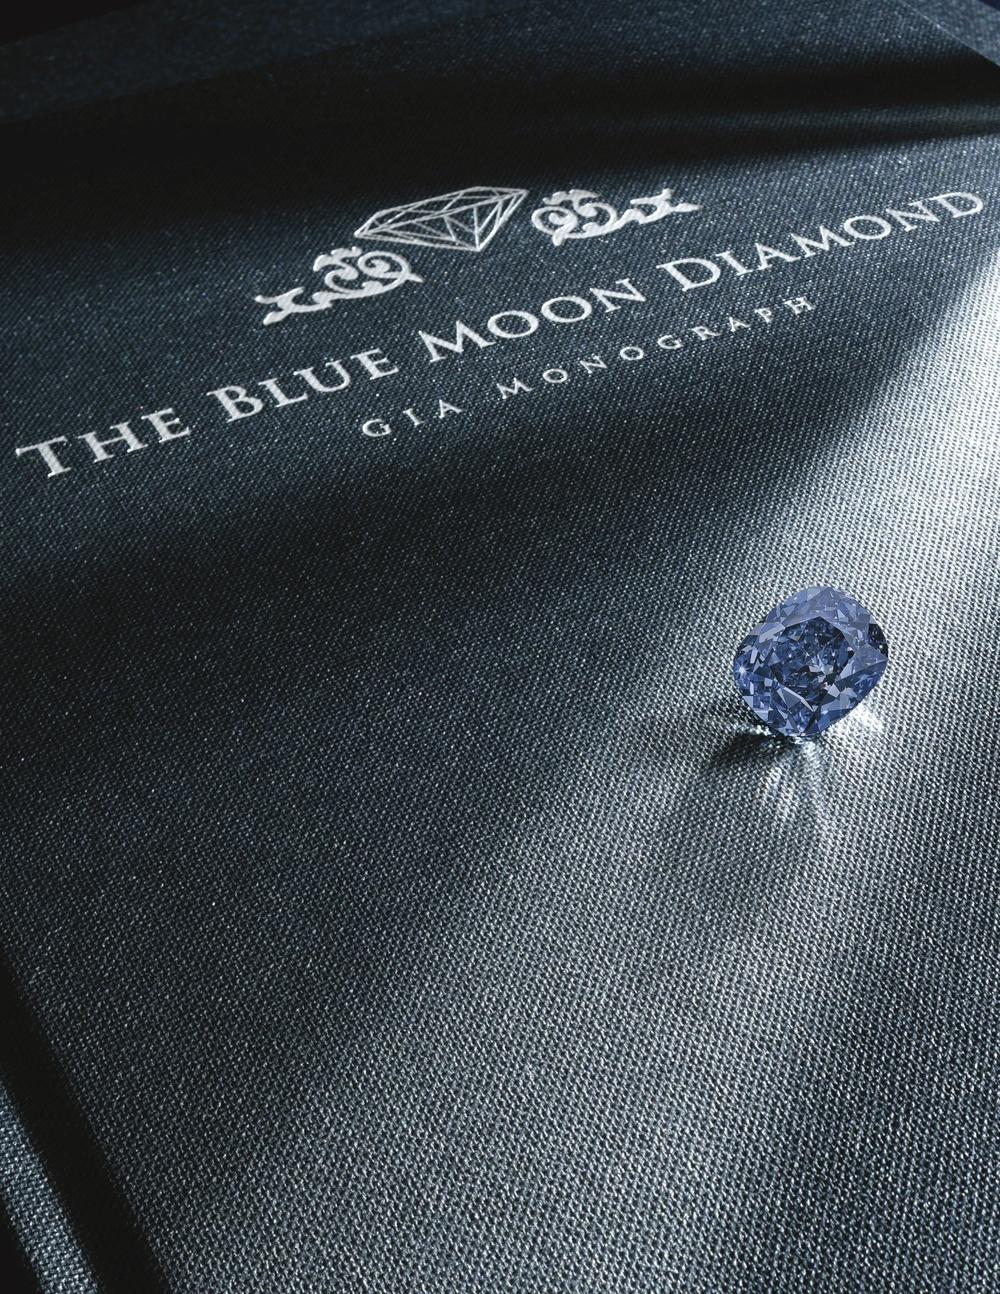 The Blue Moon Diamond, PHOTO: Sotheby's